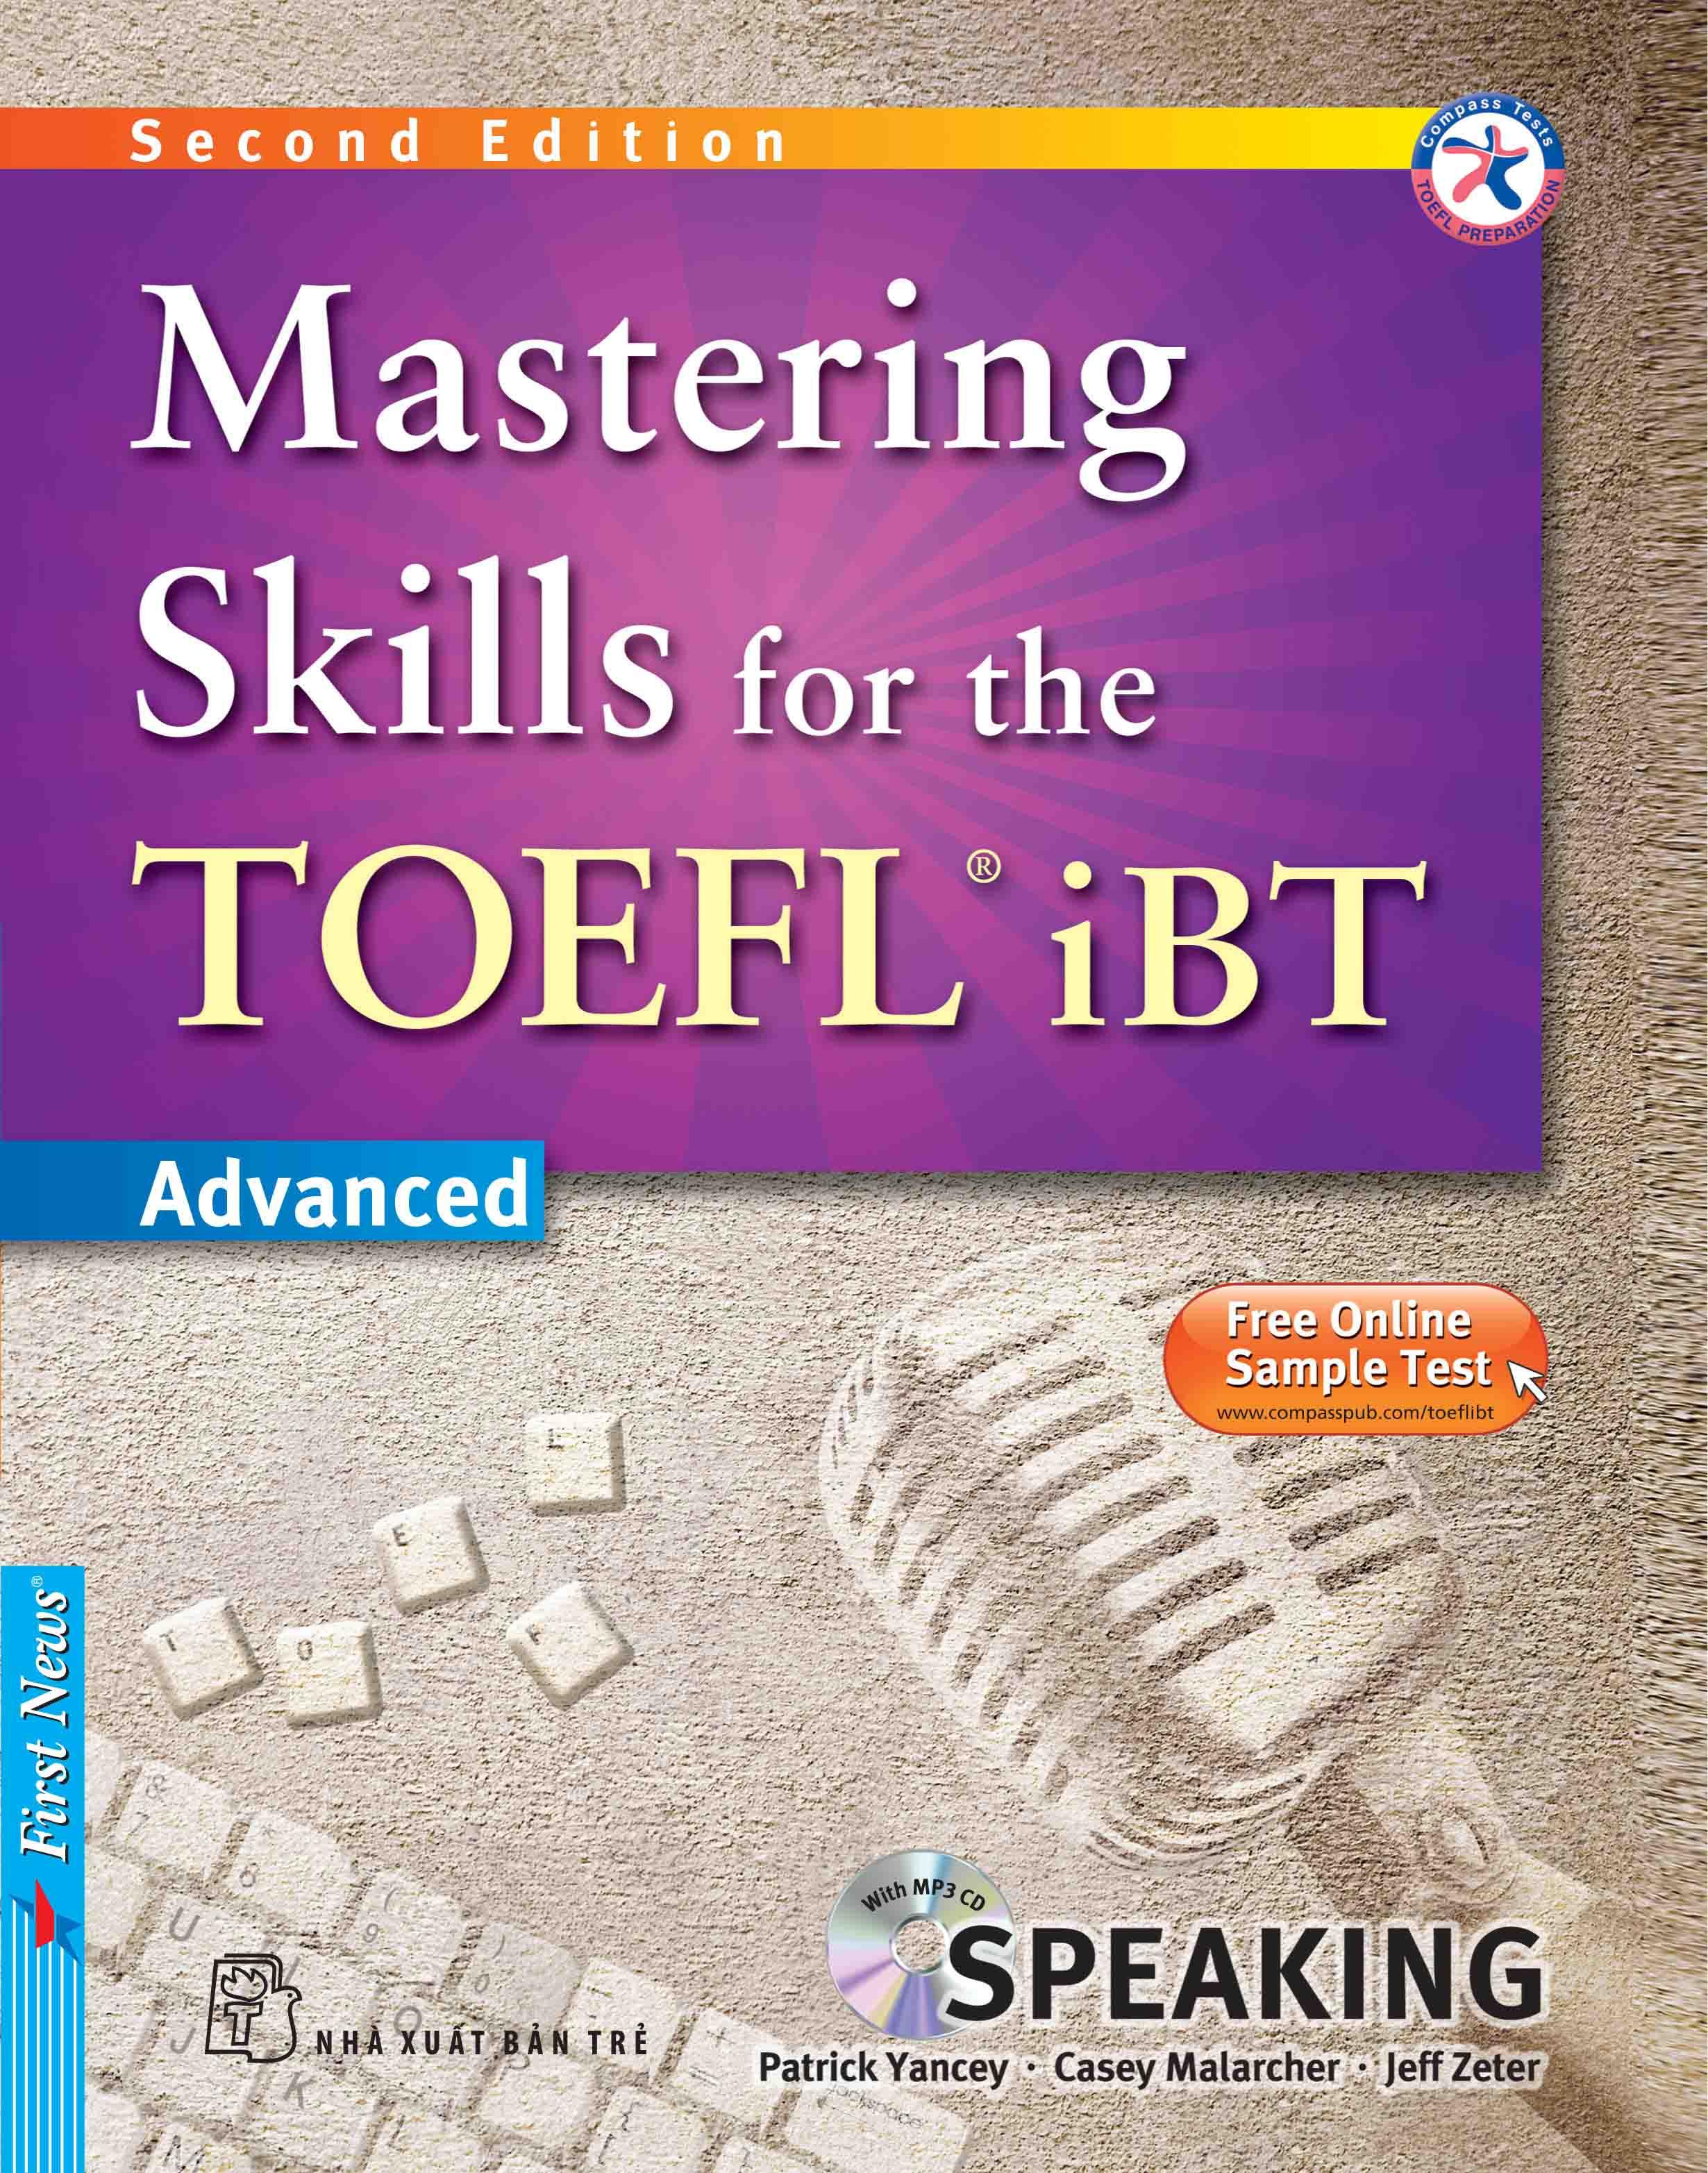 MASTERING SKILLS FOR THE TOEFL IBT - SPEAKING (Kèm CD Mp3)